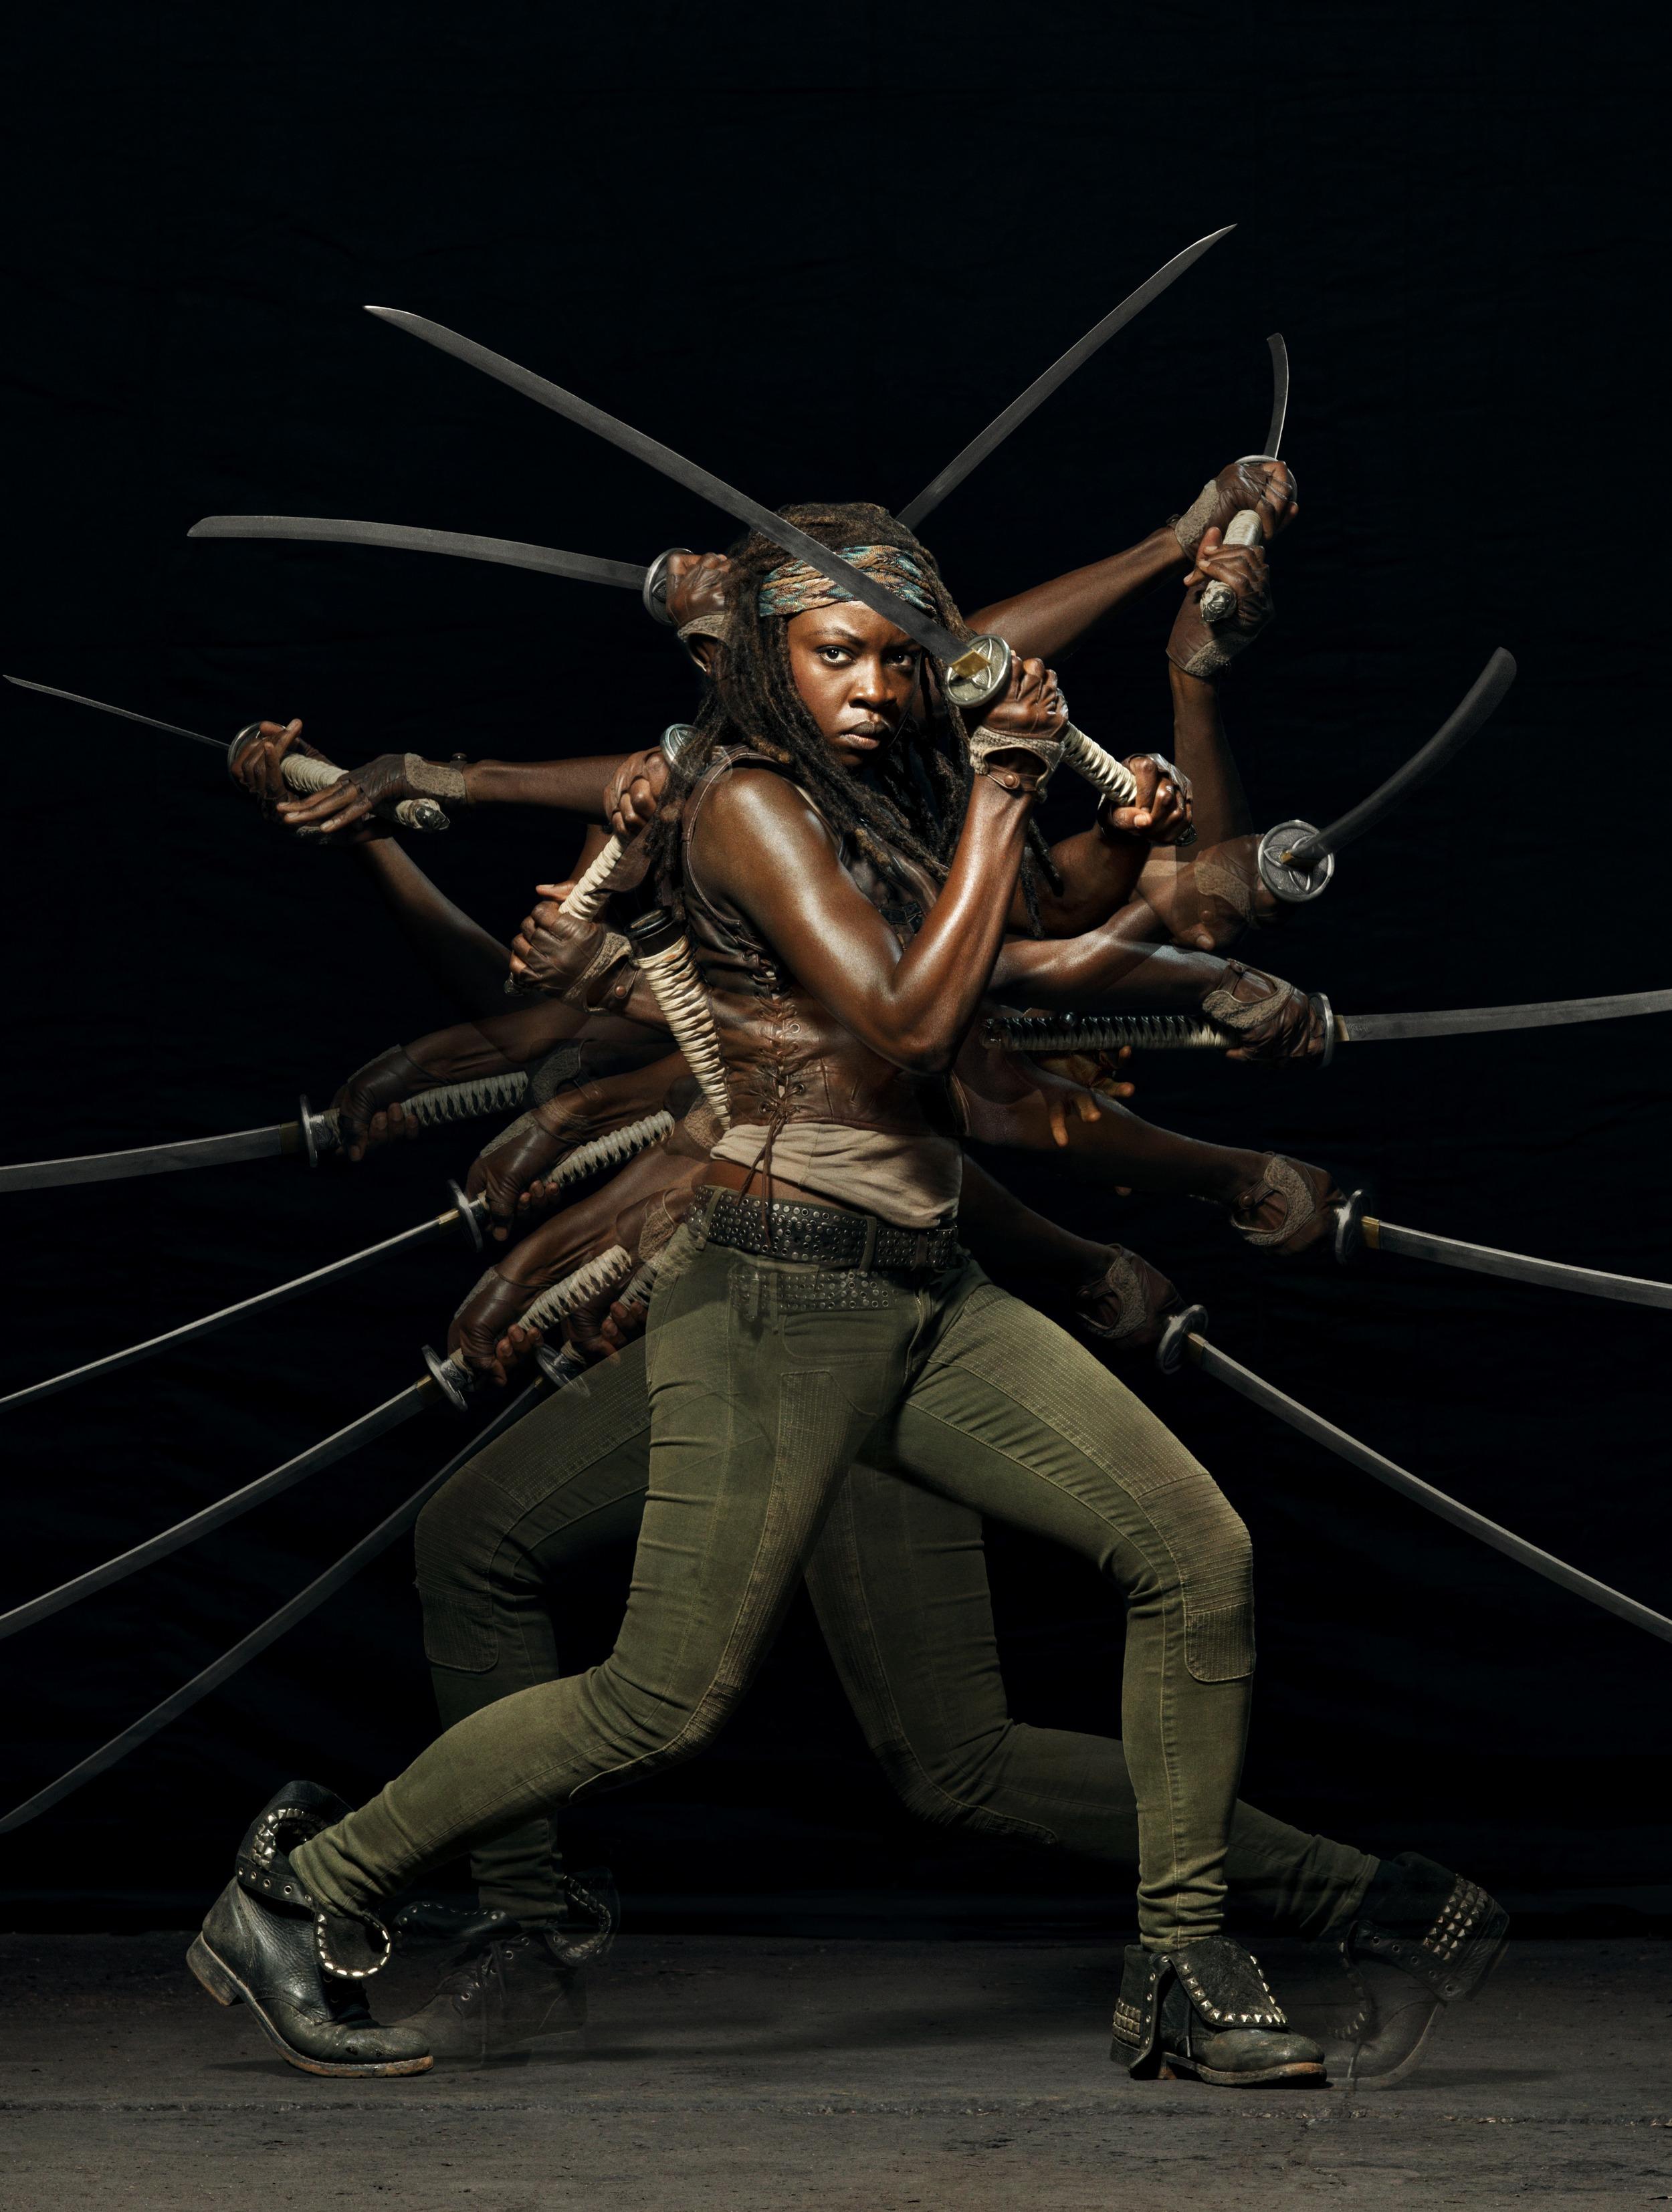 Danai Gurira for The Walking Dead